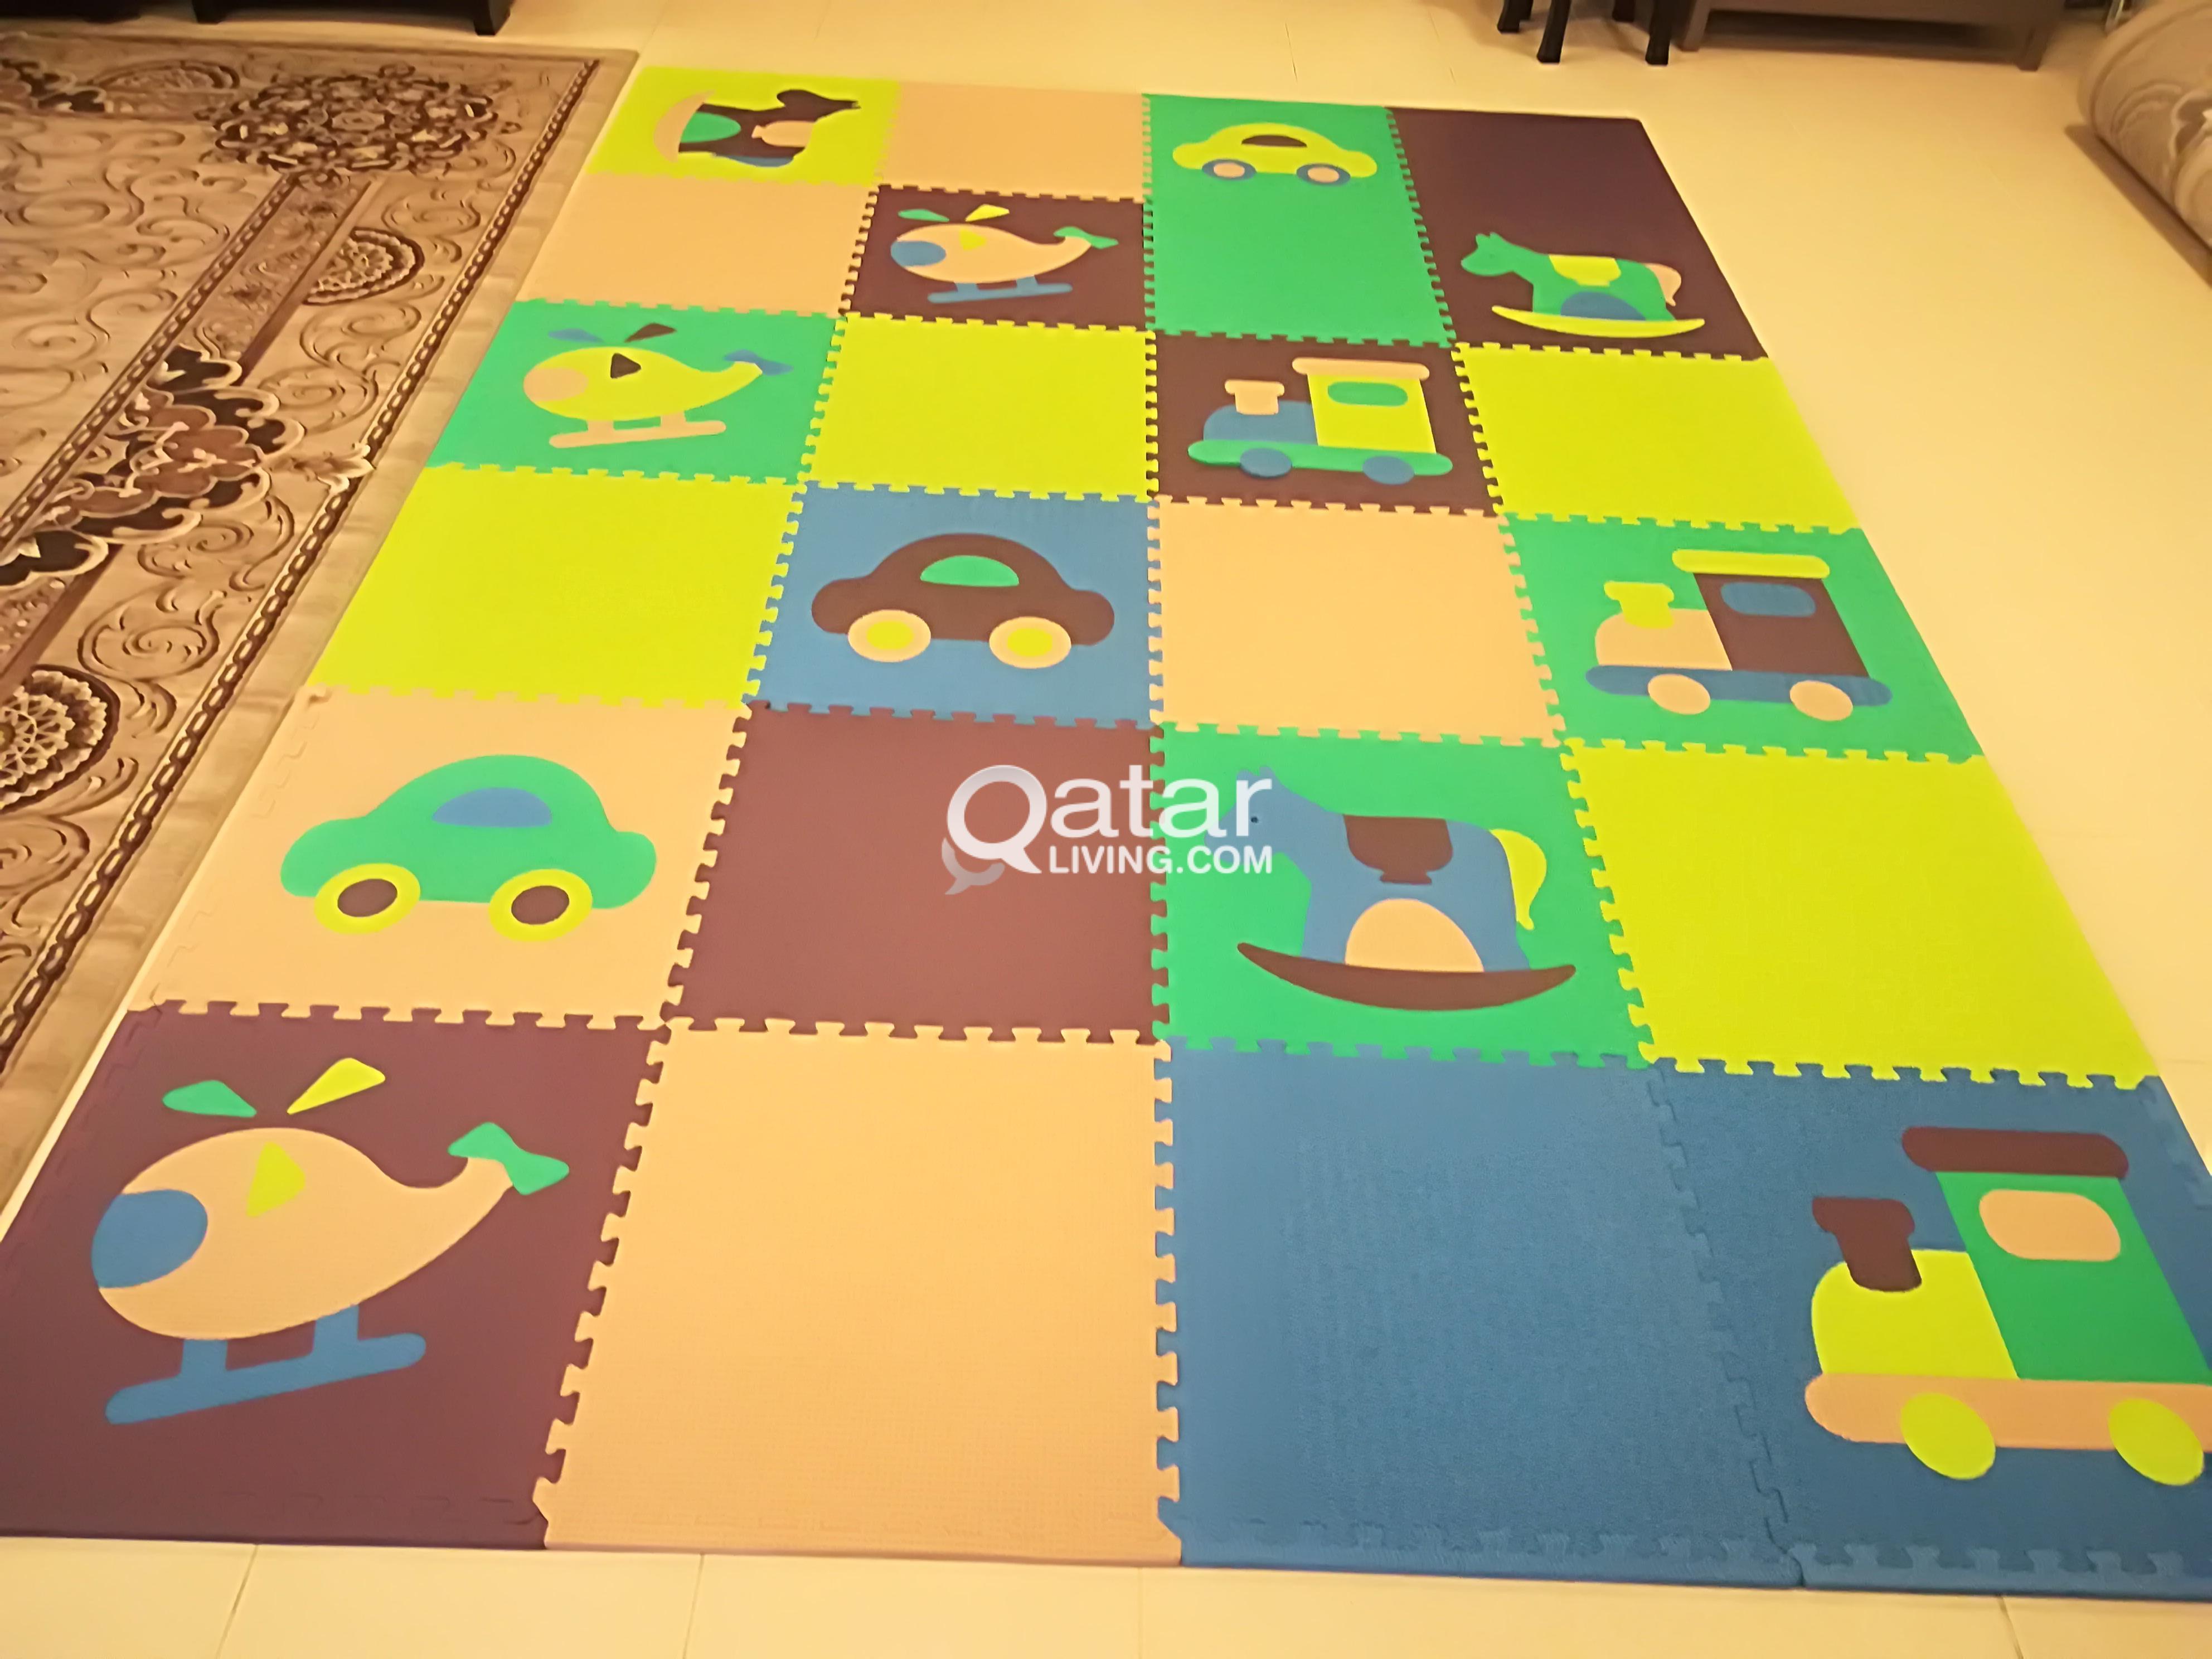 babies choice for floor mats rainbow eva pcs foam com interlocking playmat mat playing best crawling children ip baby walmart products